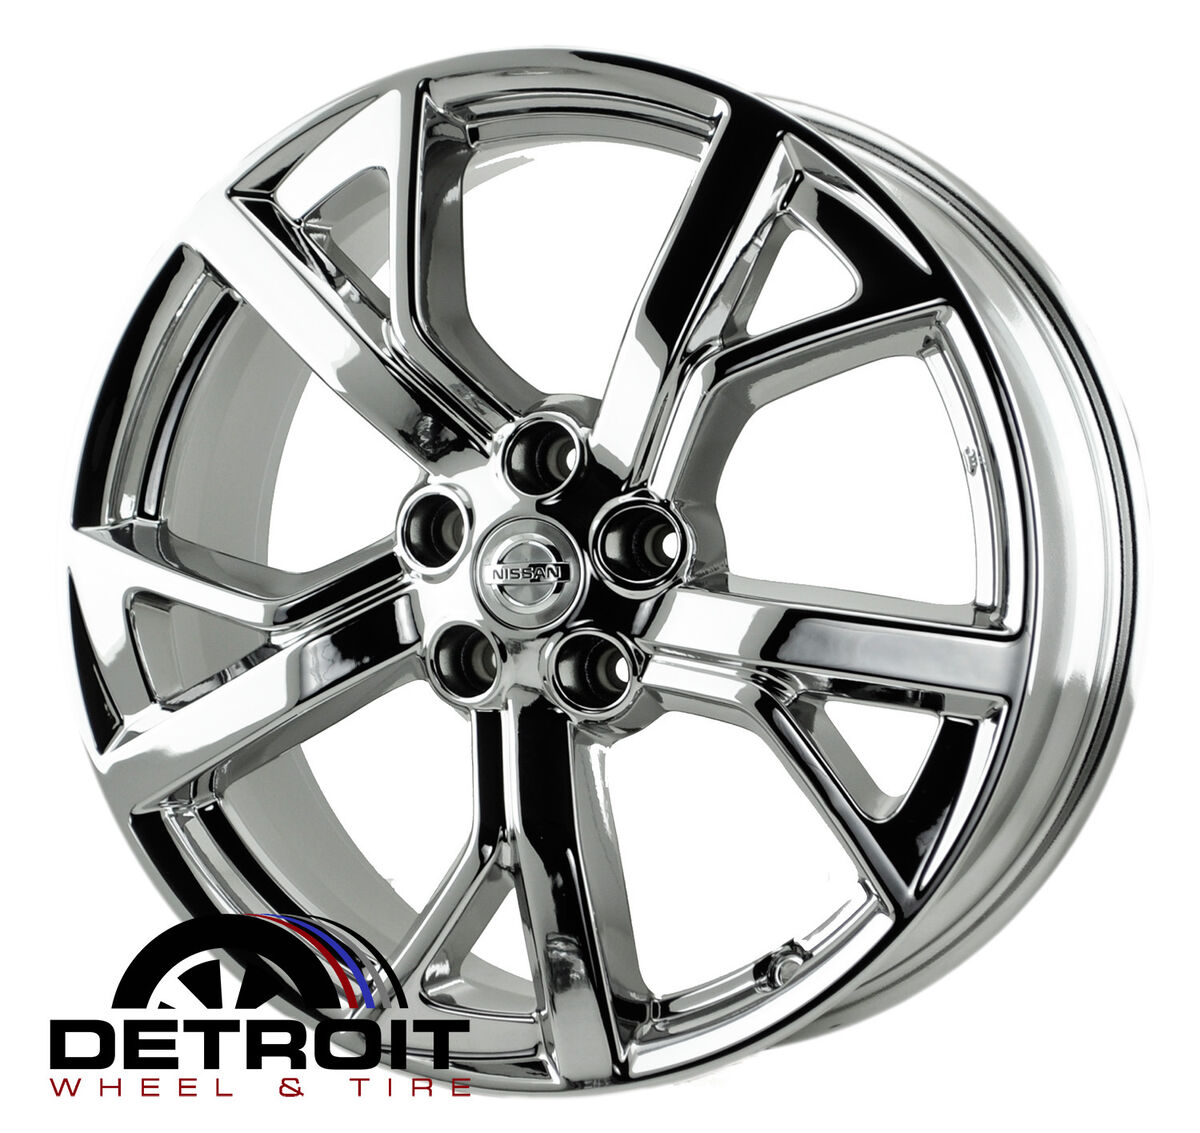 Nissan Maxima PVD Bright Chrome Wheels Factory Rim 62583 Exchange 2012 2013